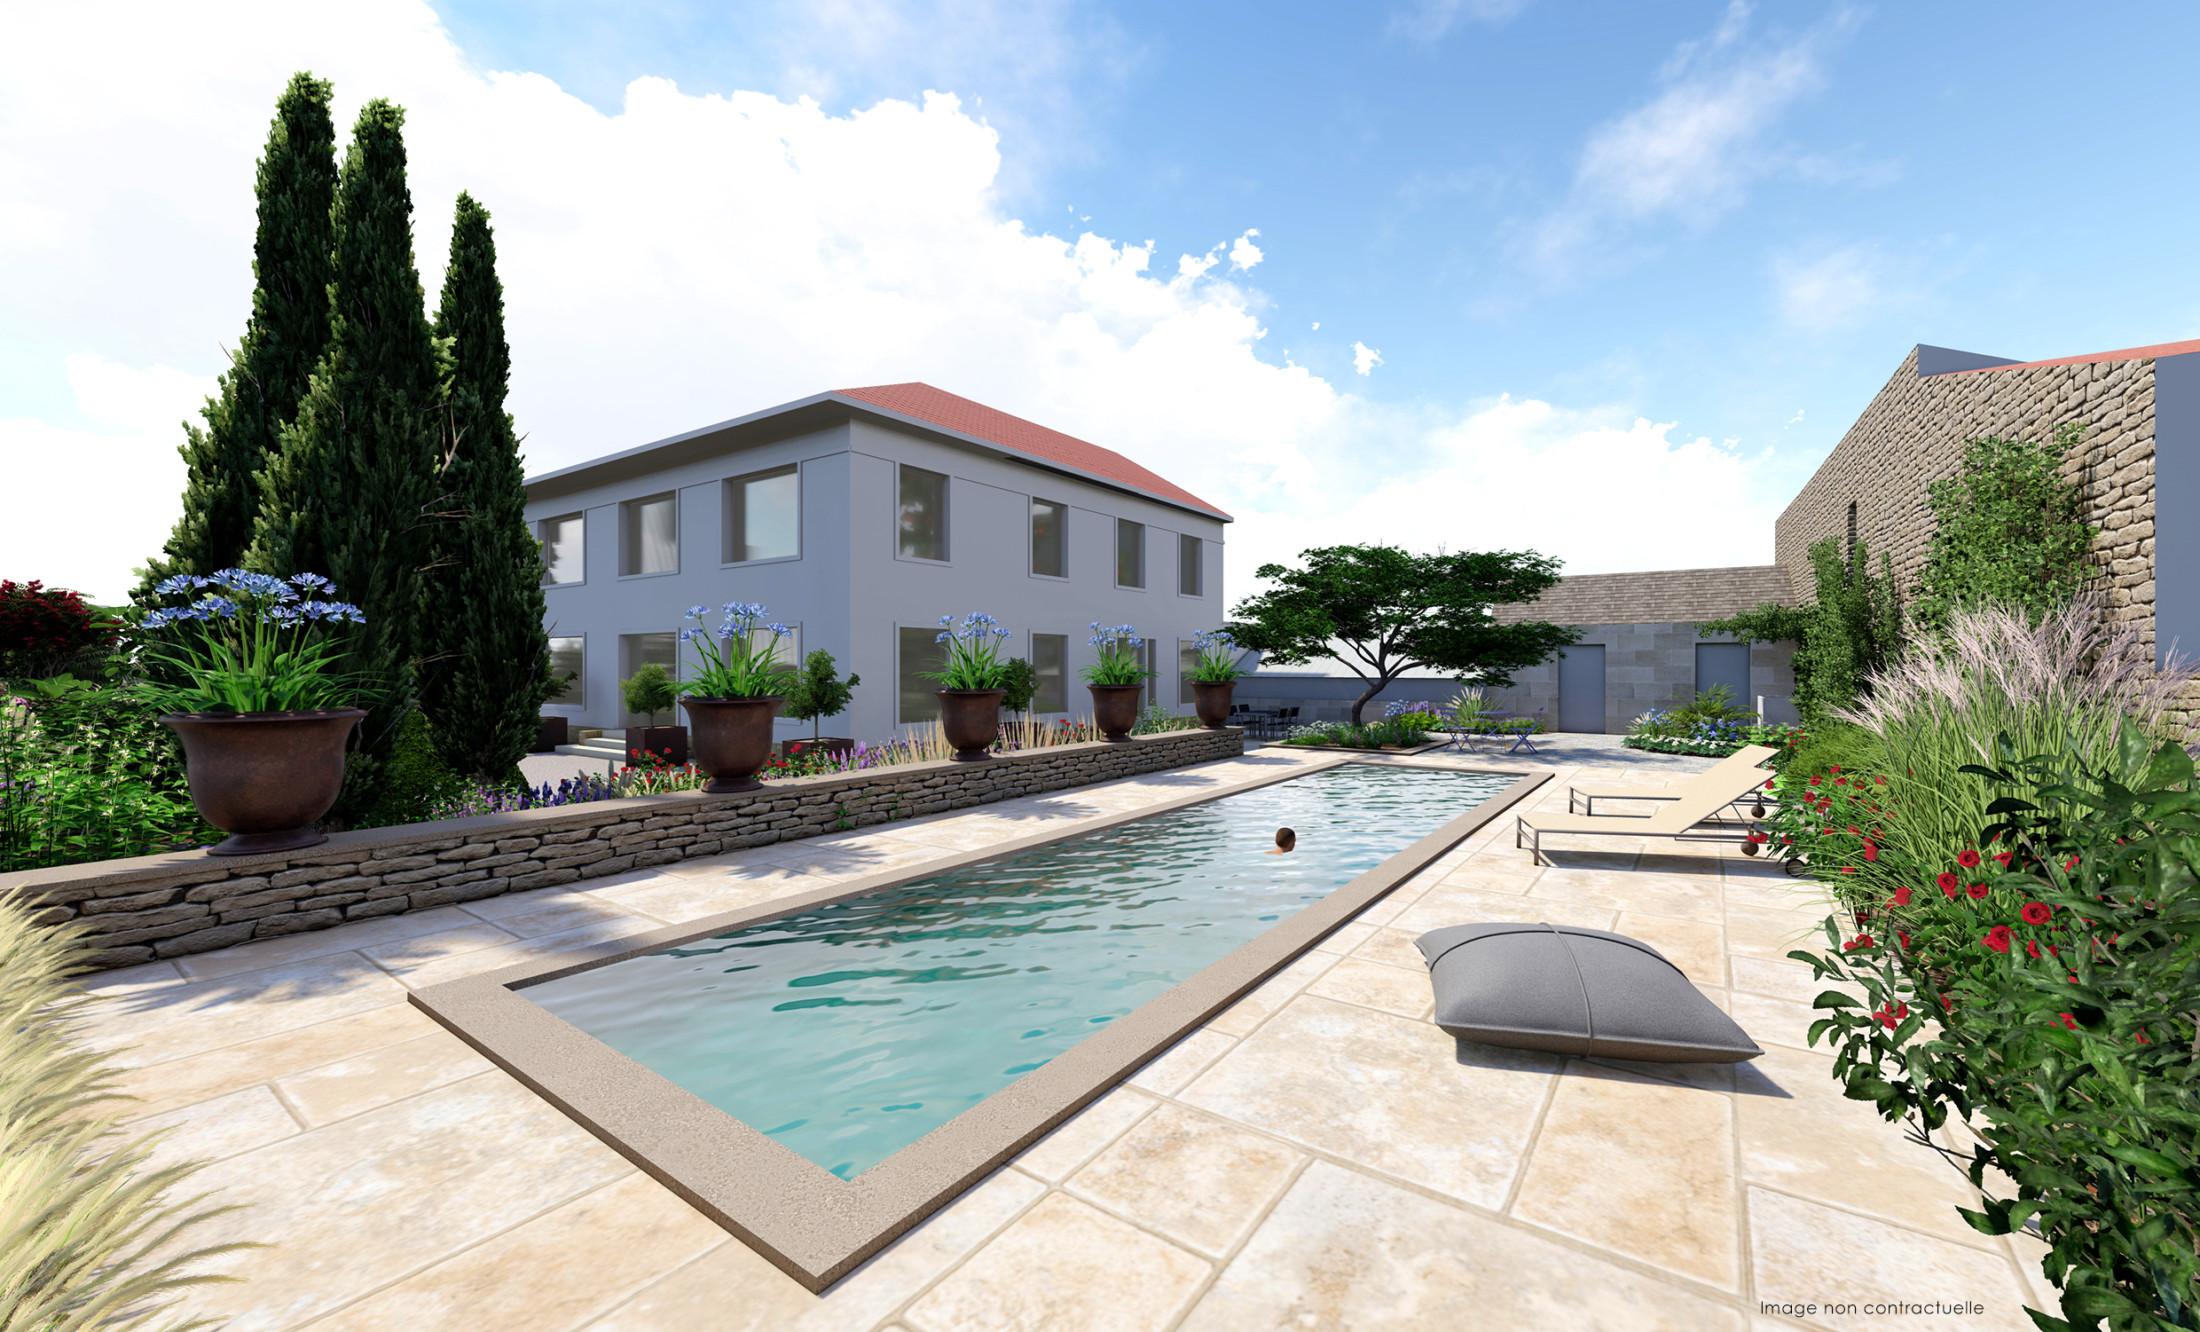 infographie paysagiste jardin piscine